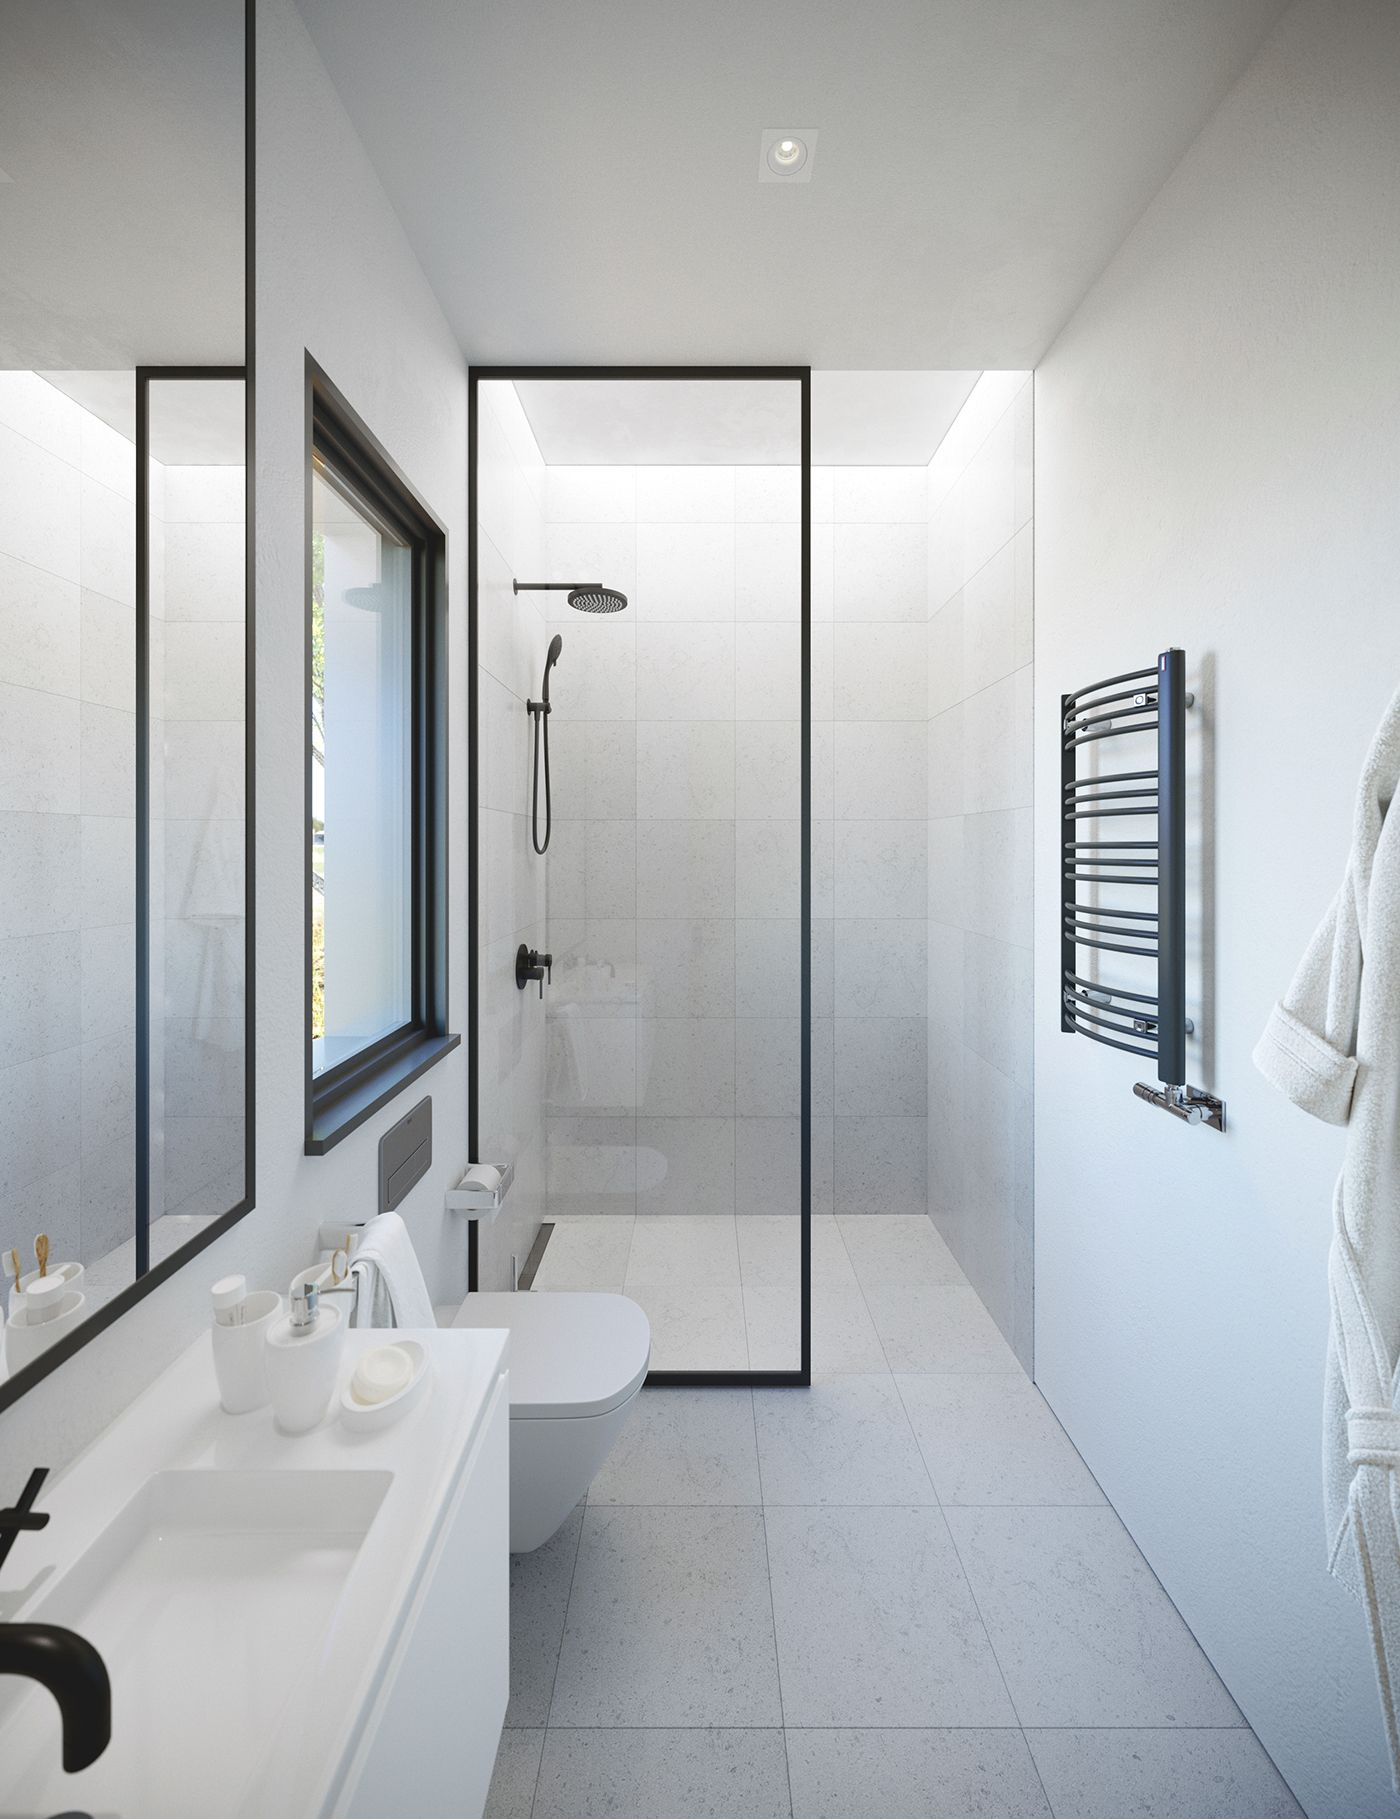 Villa In White On Behance Minimalist Bathroom Design Modern Bathroom Design Minimalist Bathroom